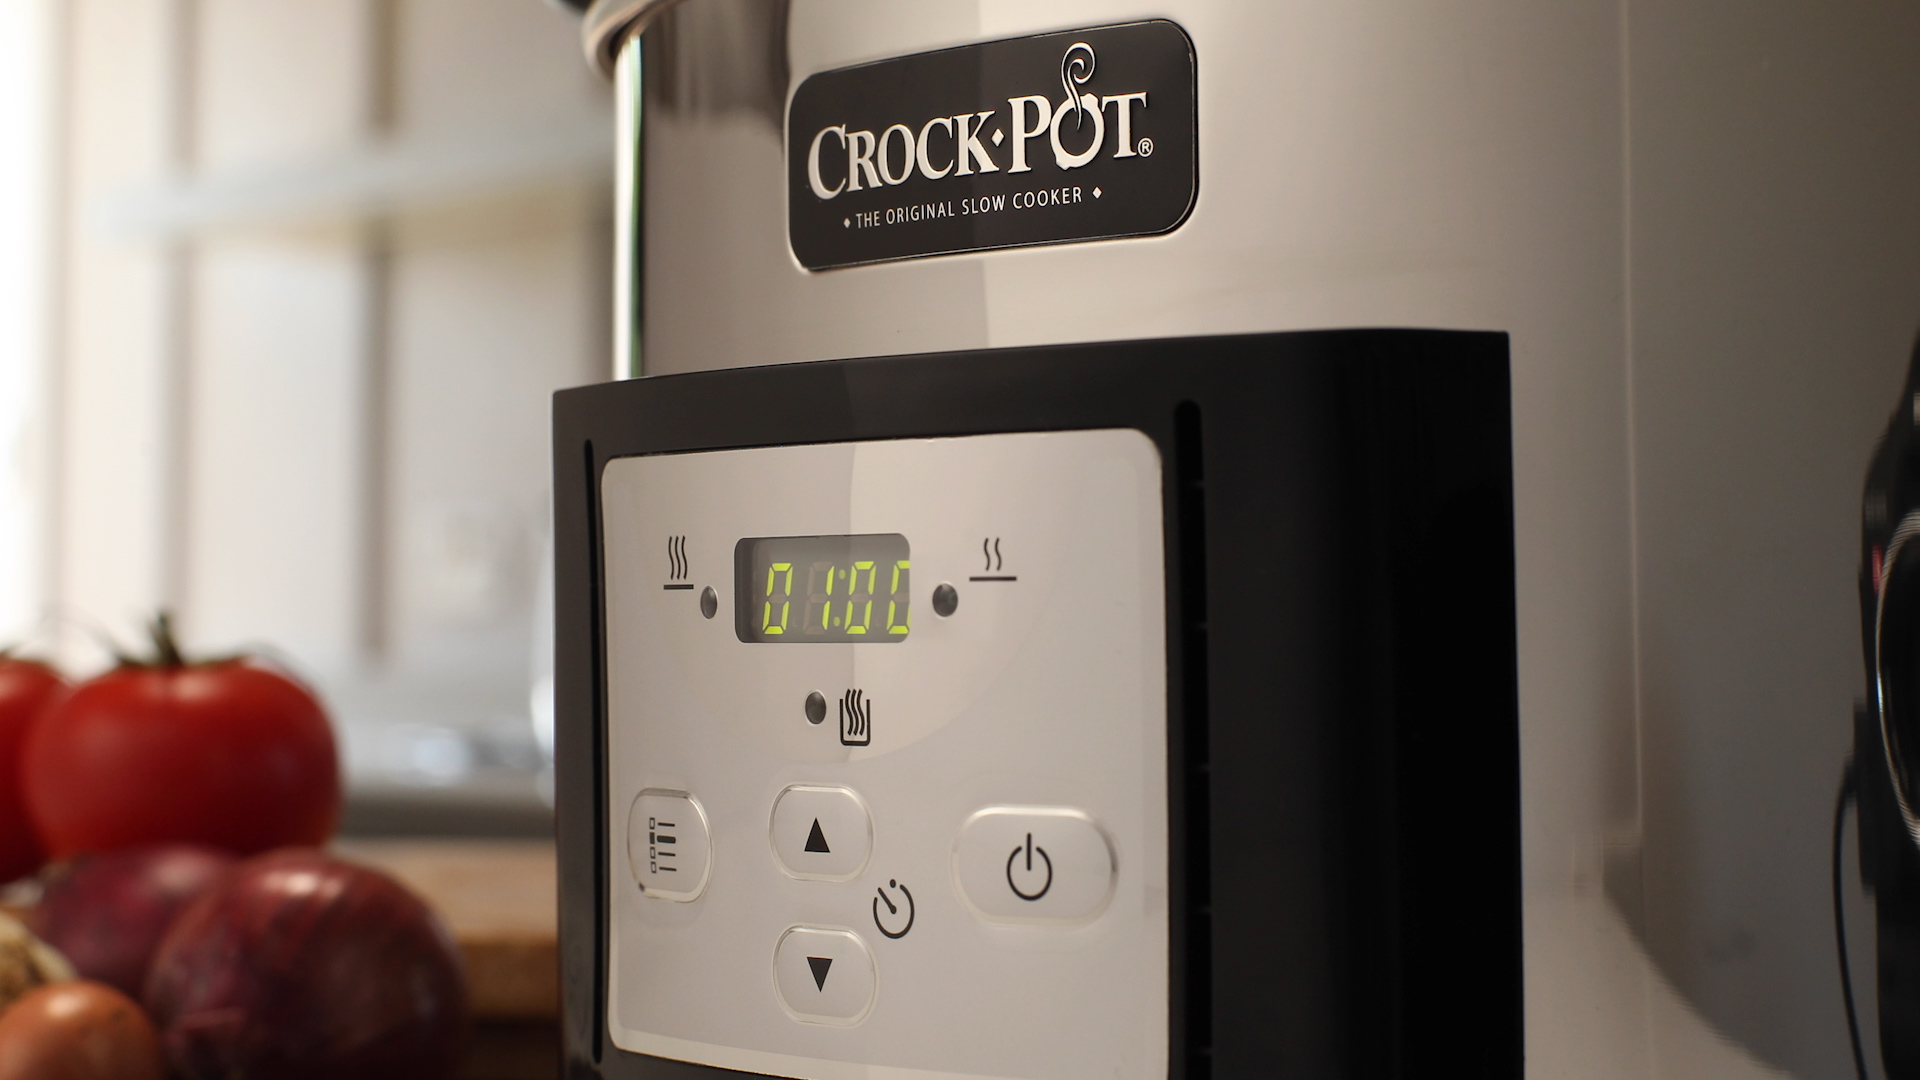 crock-pot cocinar